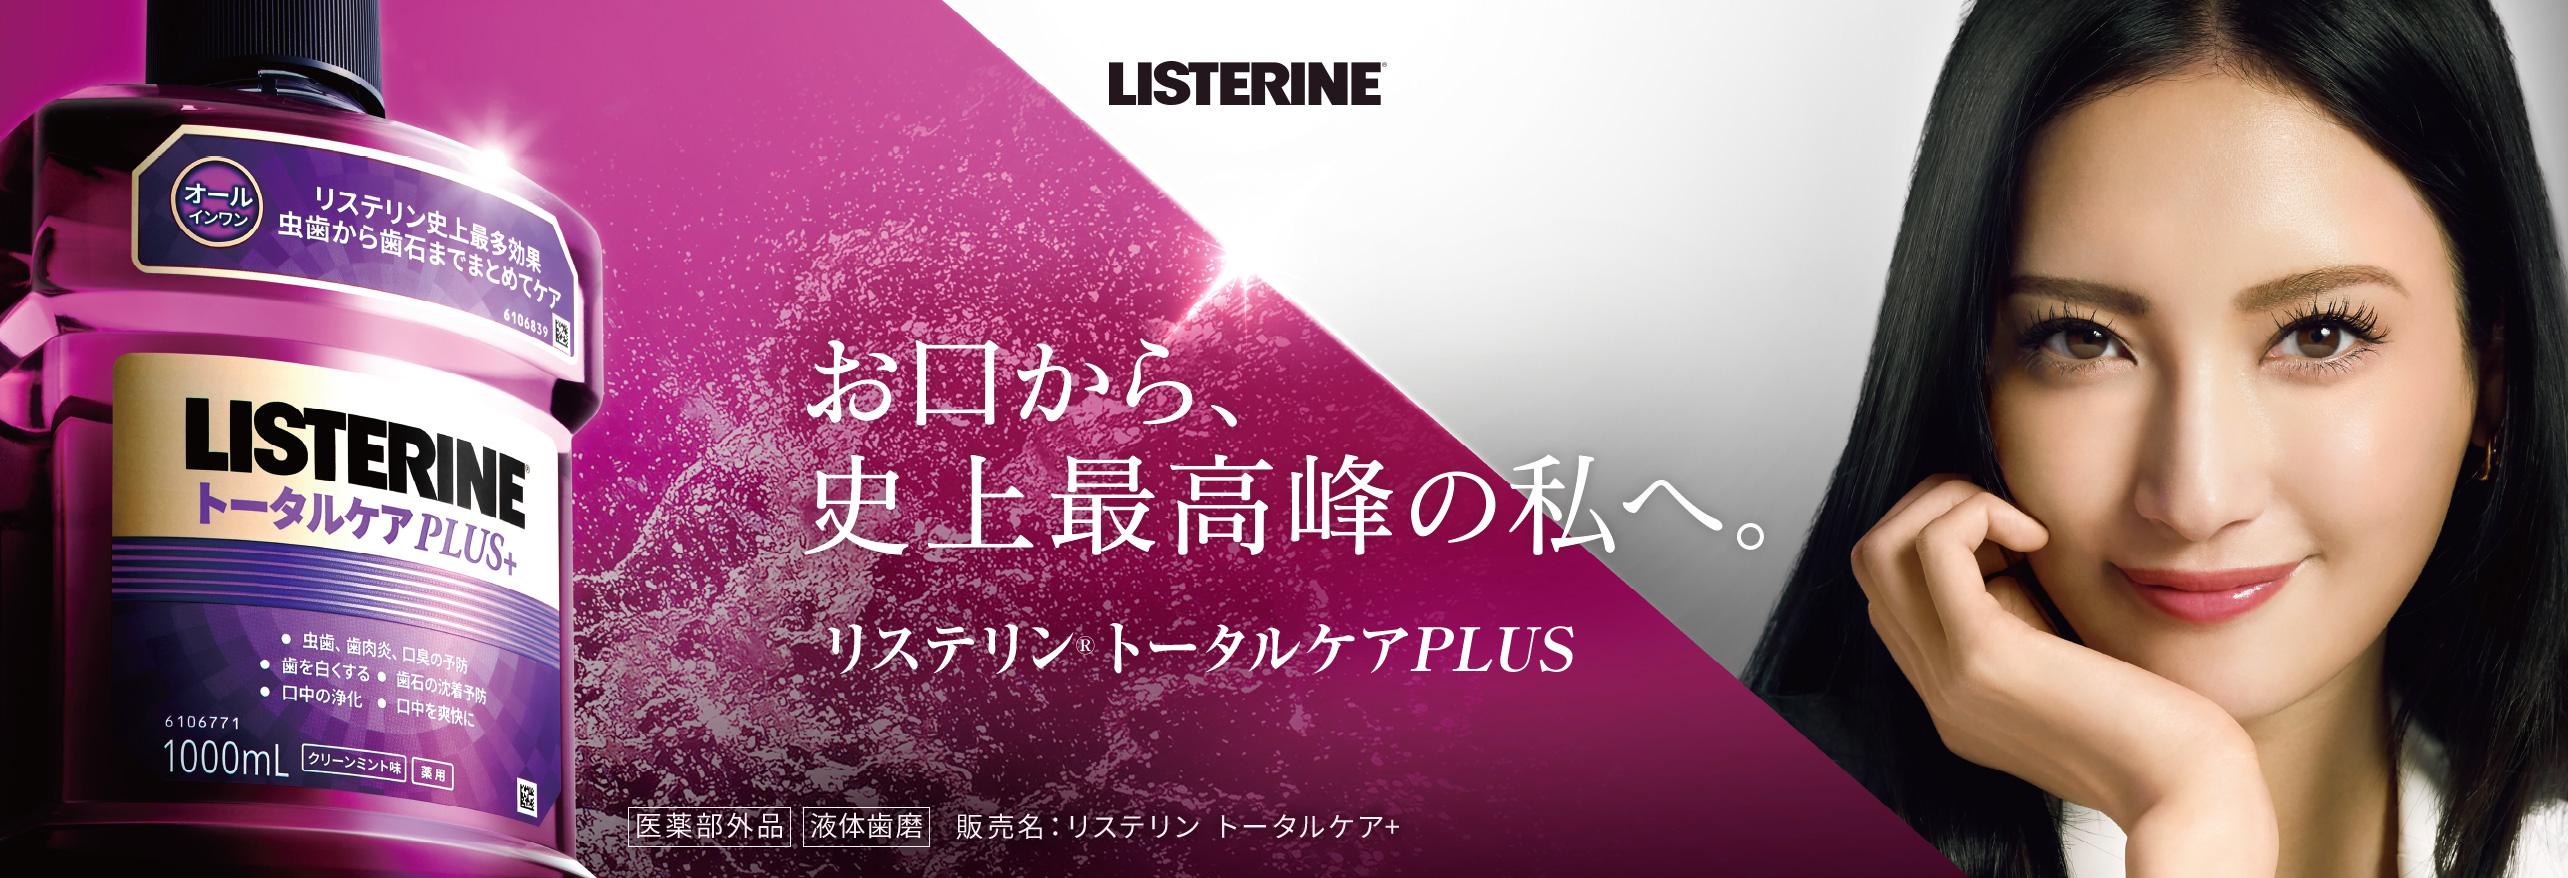 https://www.listerine-jp.com/sites/listerine_jp/files/taco-images/topbnr_totalcare_pc191009.jpg